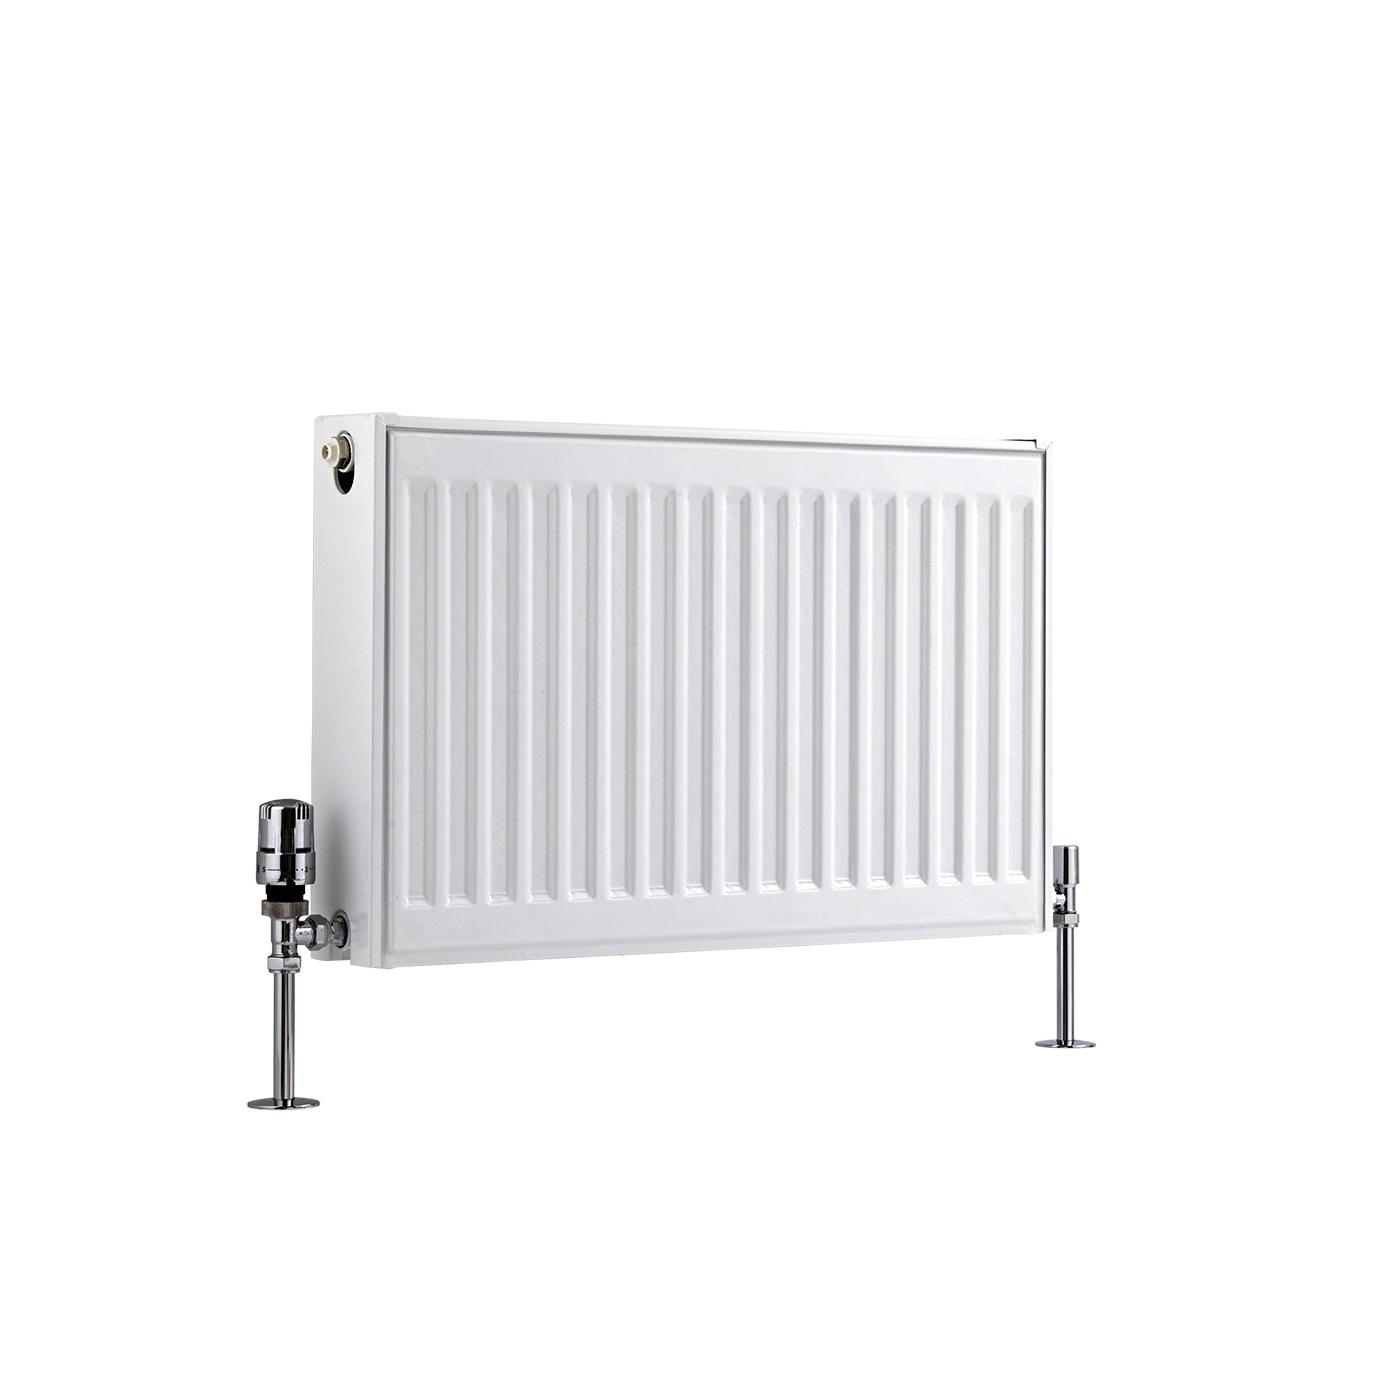 Radiateur À Panneaux Type 22 Horizontal Blanc Eco 40cm x 60cm x 10,3cm 693 Watts